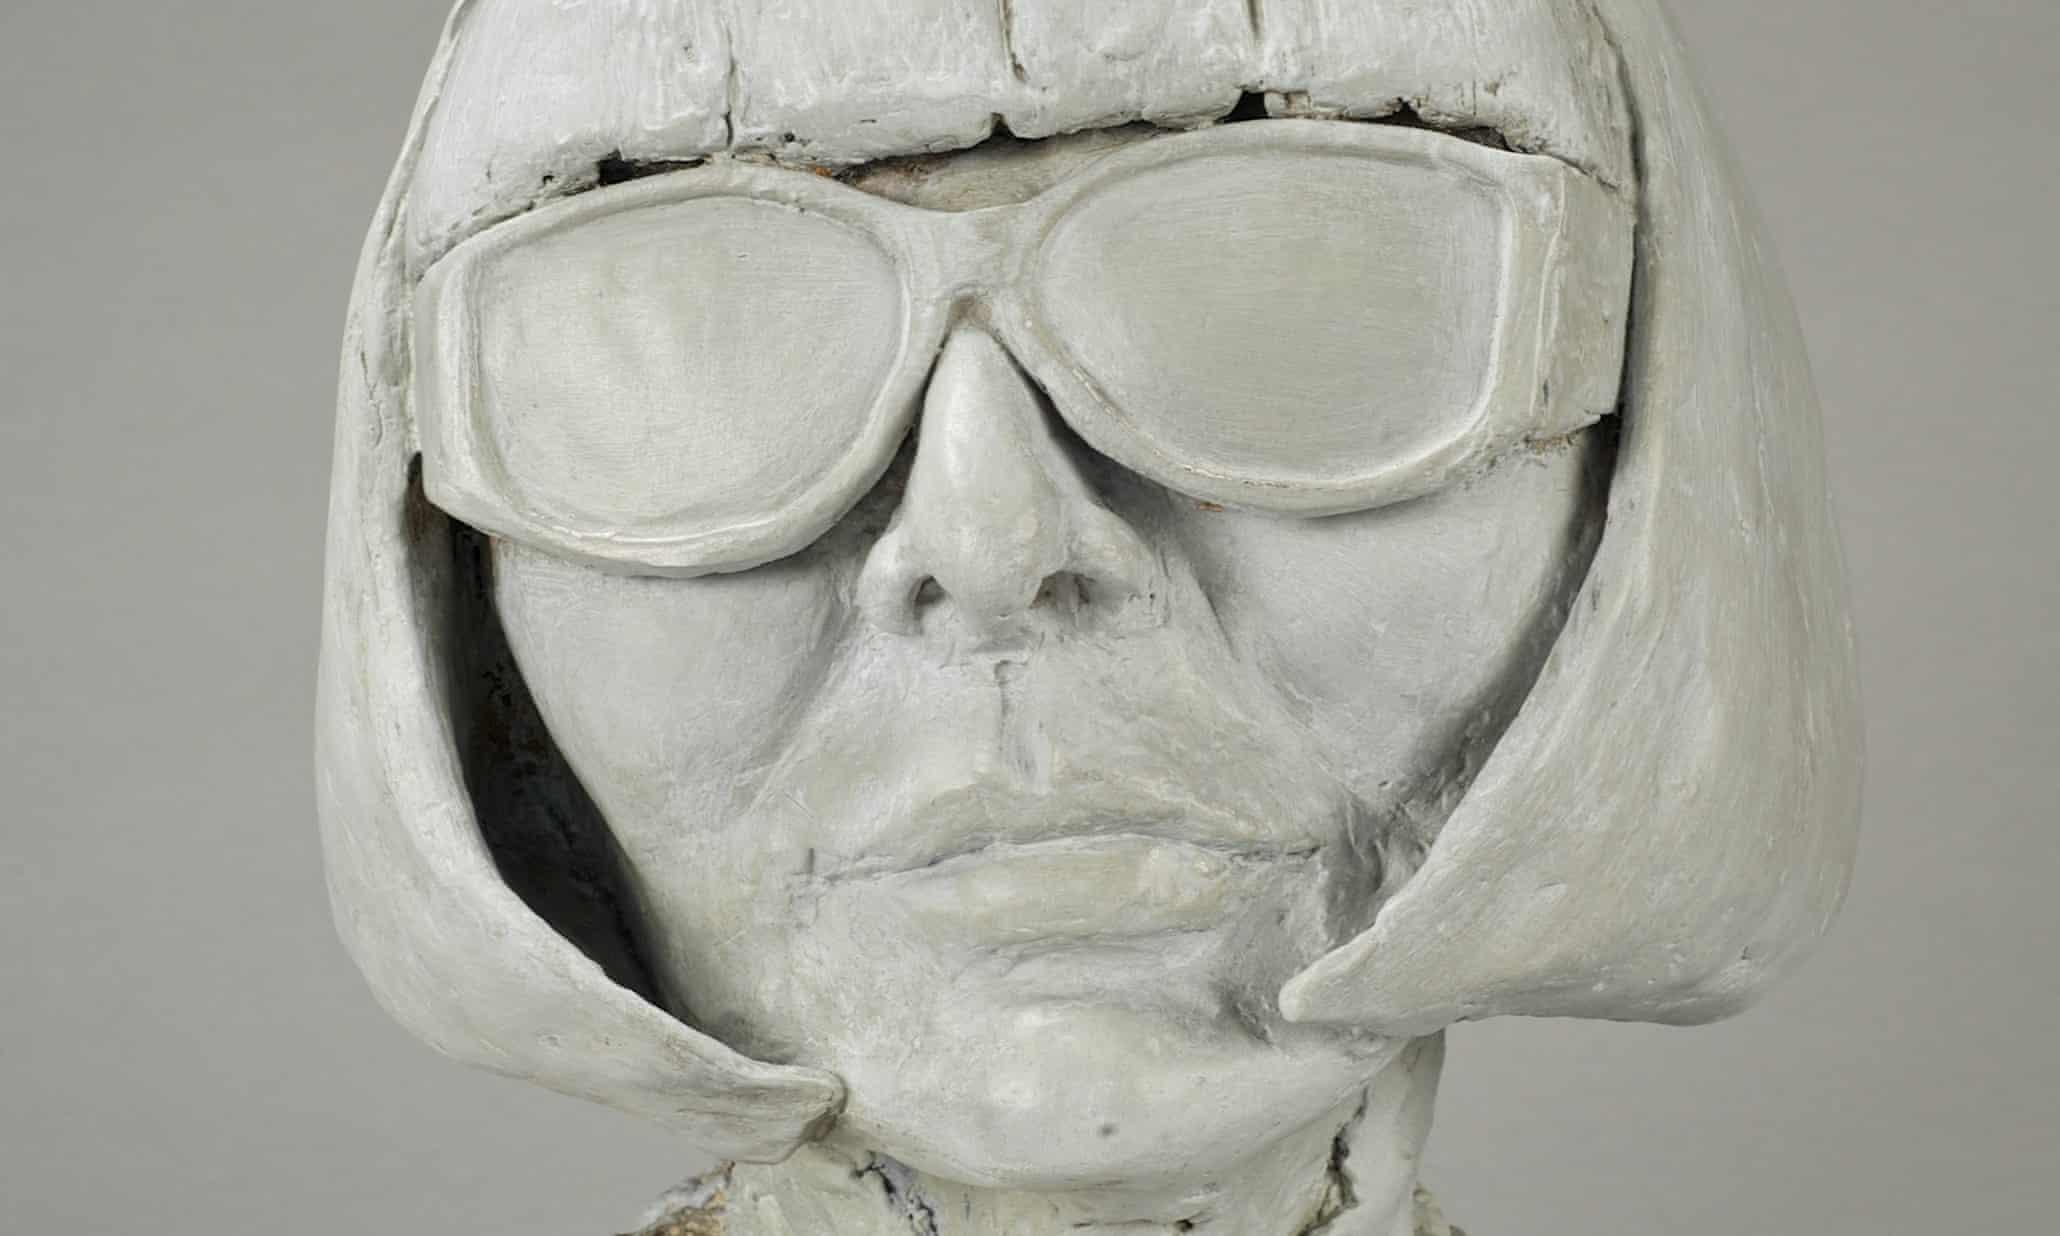 Fashion or bust: Nicole Farhi sculpts Anna Wintour, Helena Bonham Carter and Bill Nighy